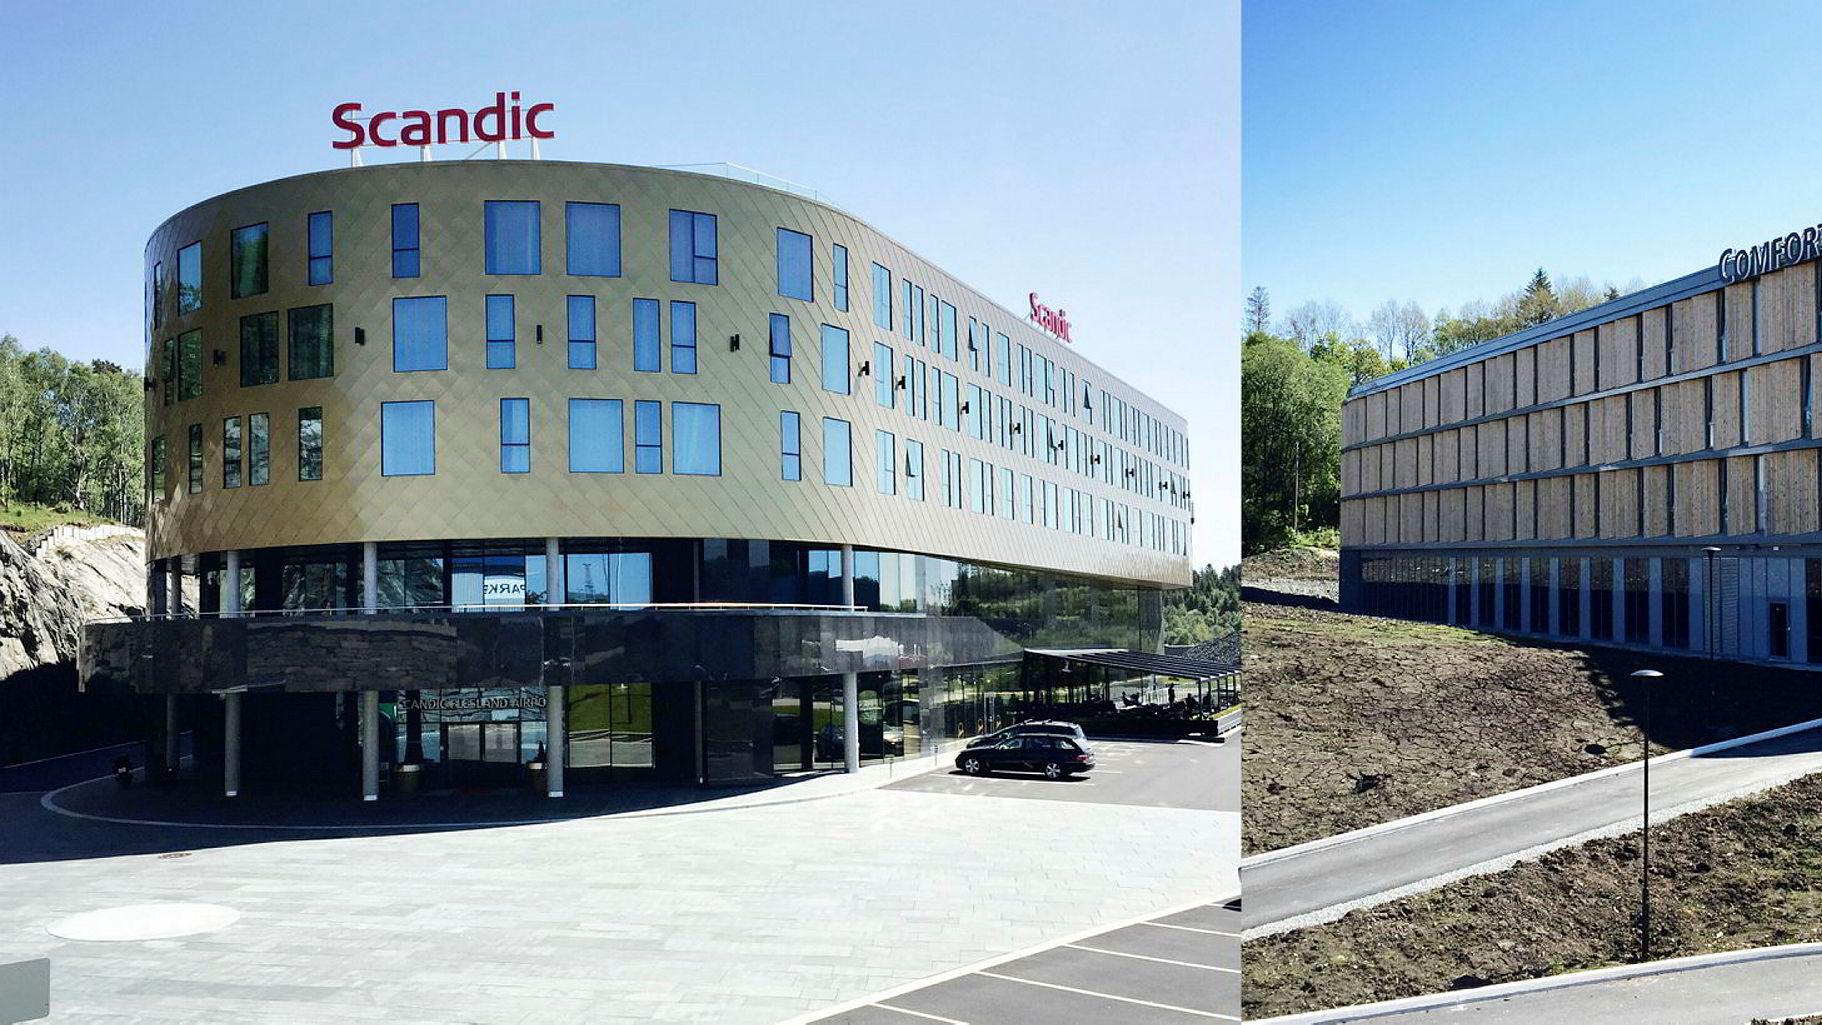 Scandic Flesland Airport og Comfort Hotel Bergen Airport åpnet begge i år.